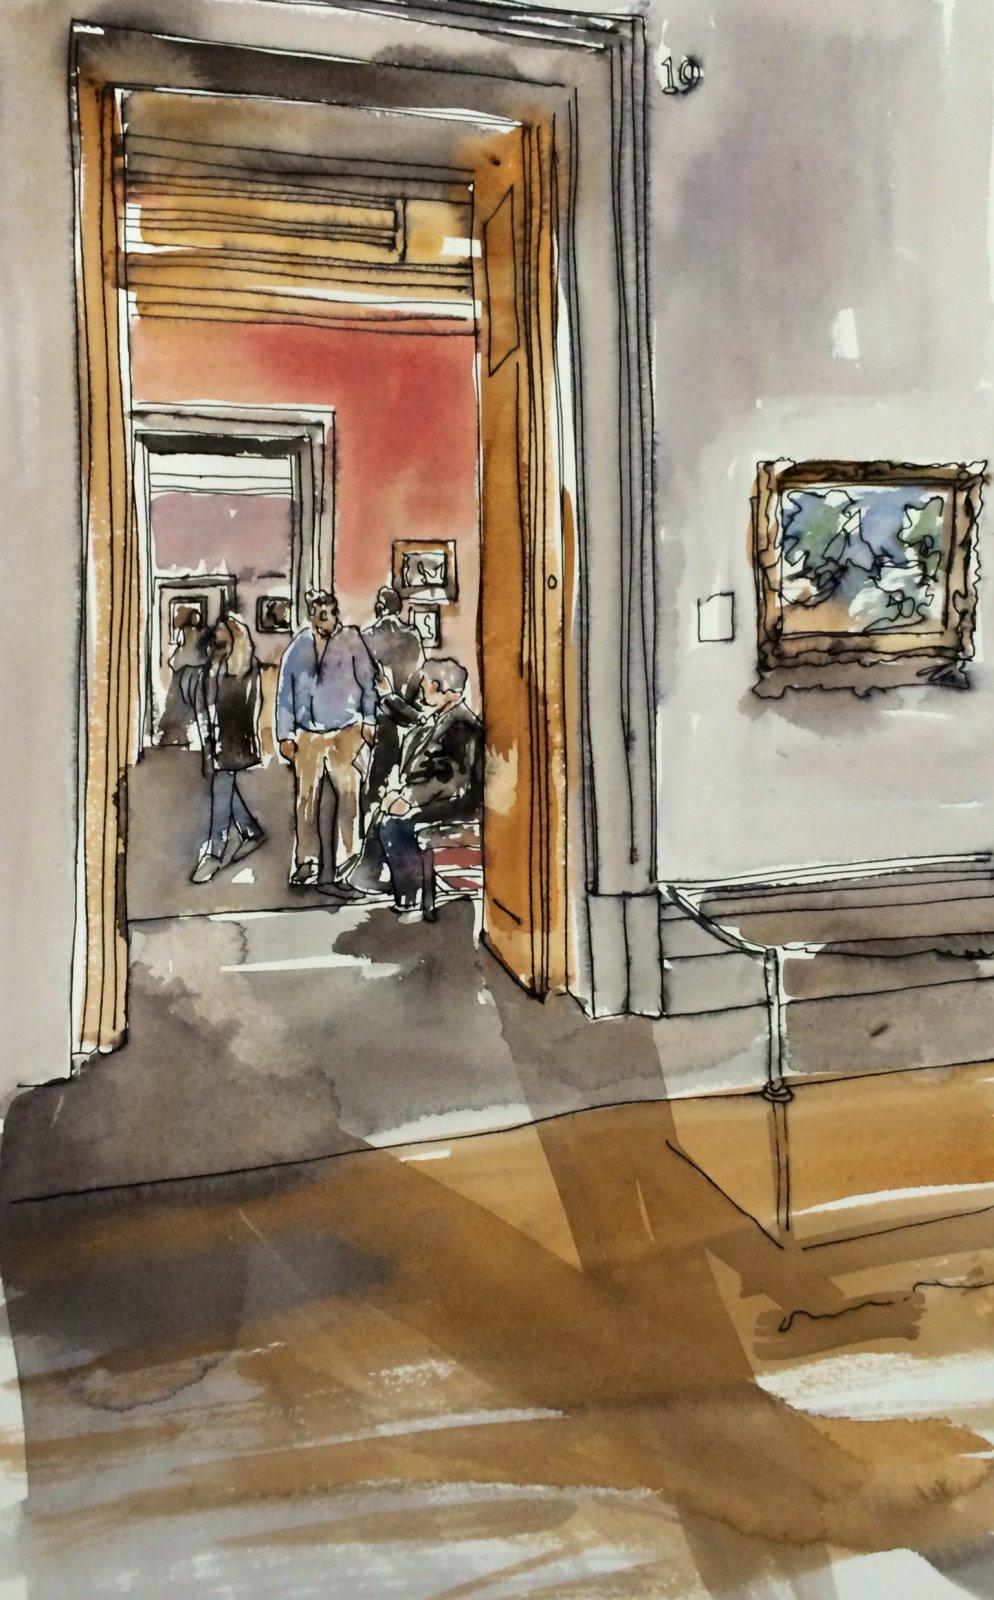 National Gallery Interior II, Thomas Plunkett PRWS